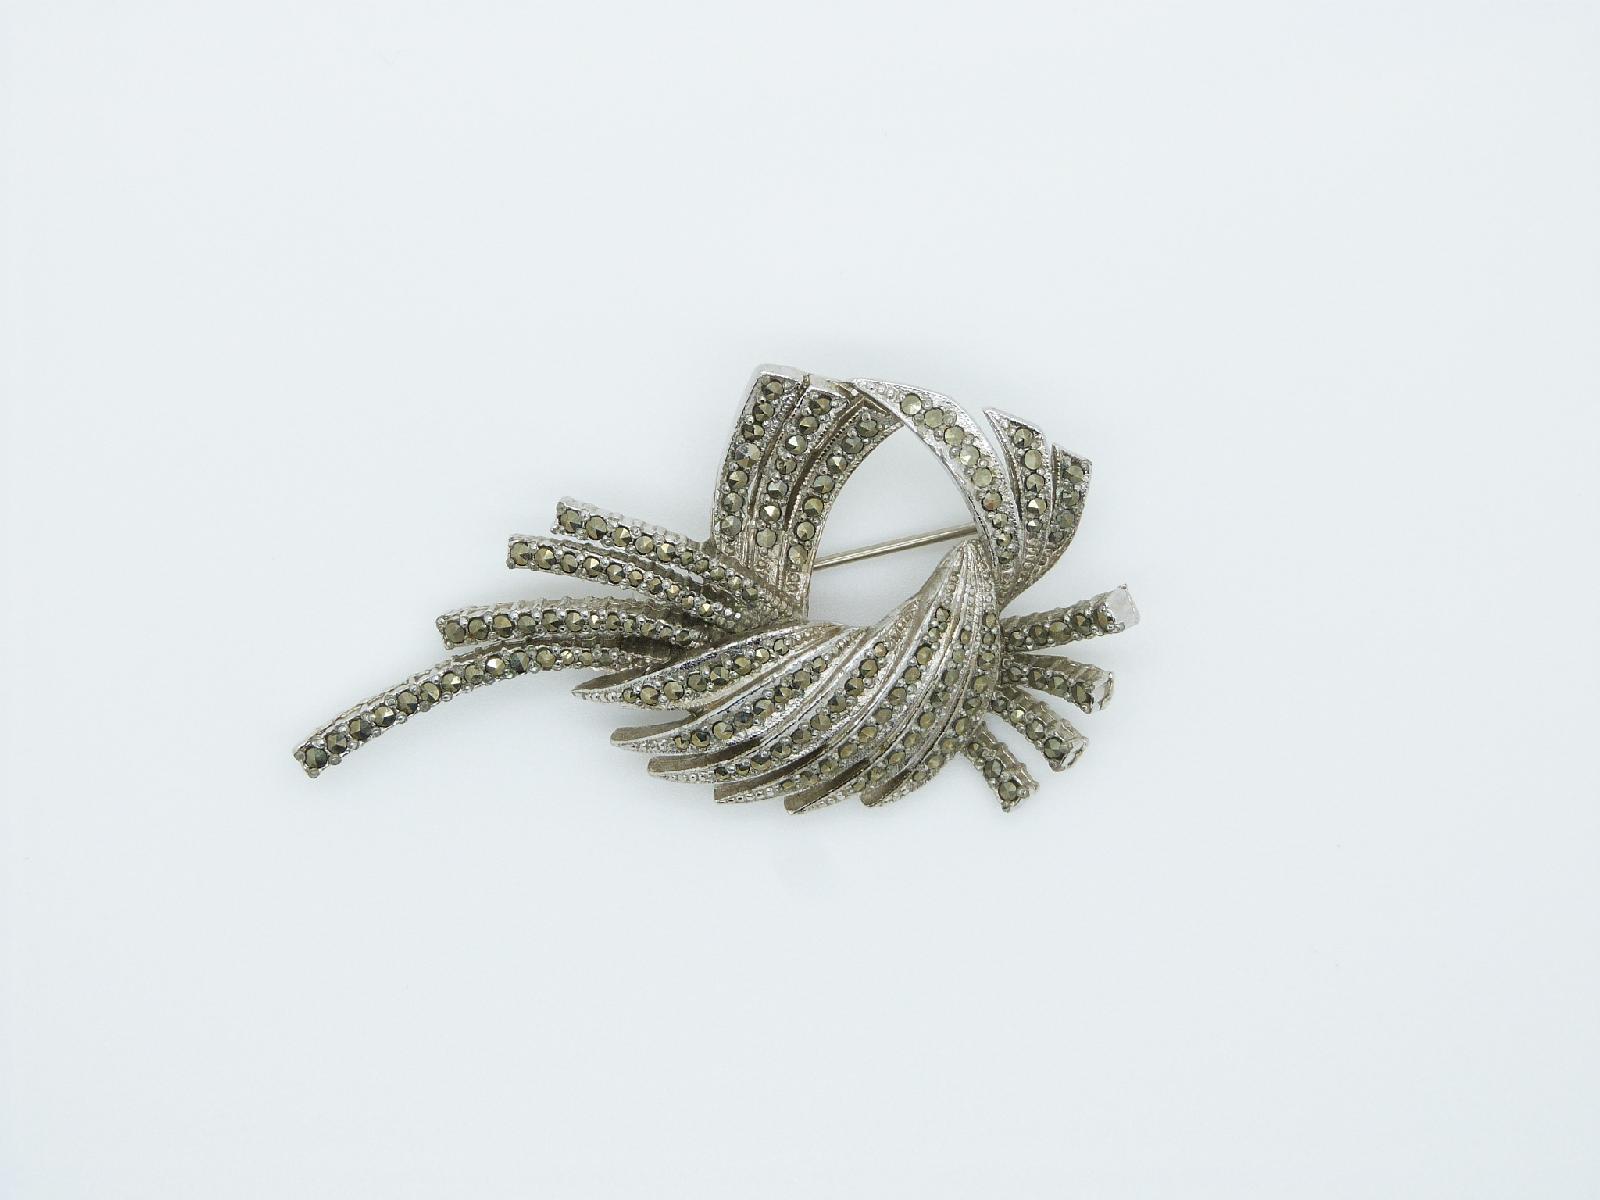 £20.00 - Vintage 40s Signed Sphinx Marcasite Floral Swirl Design Marcasite Brooch